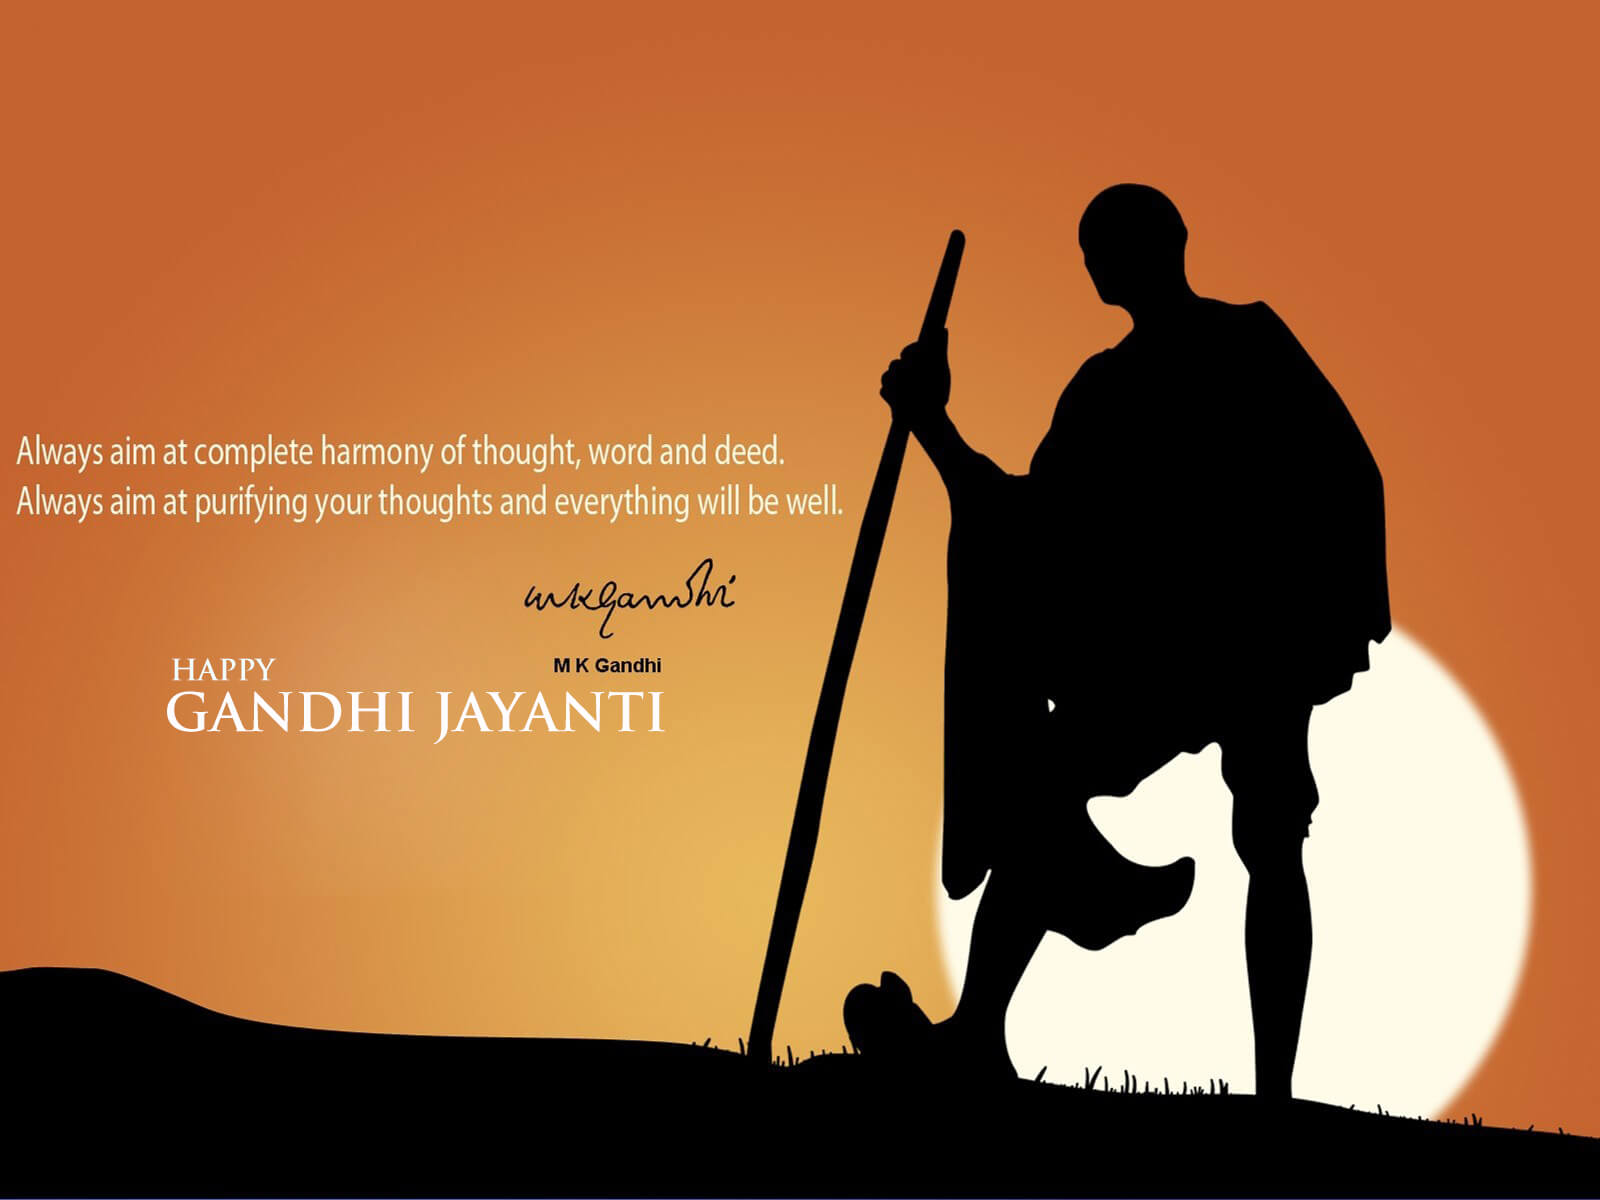 gandhi jayanti quotes wishes october 2 wallpaper